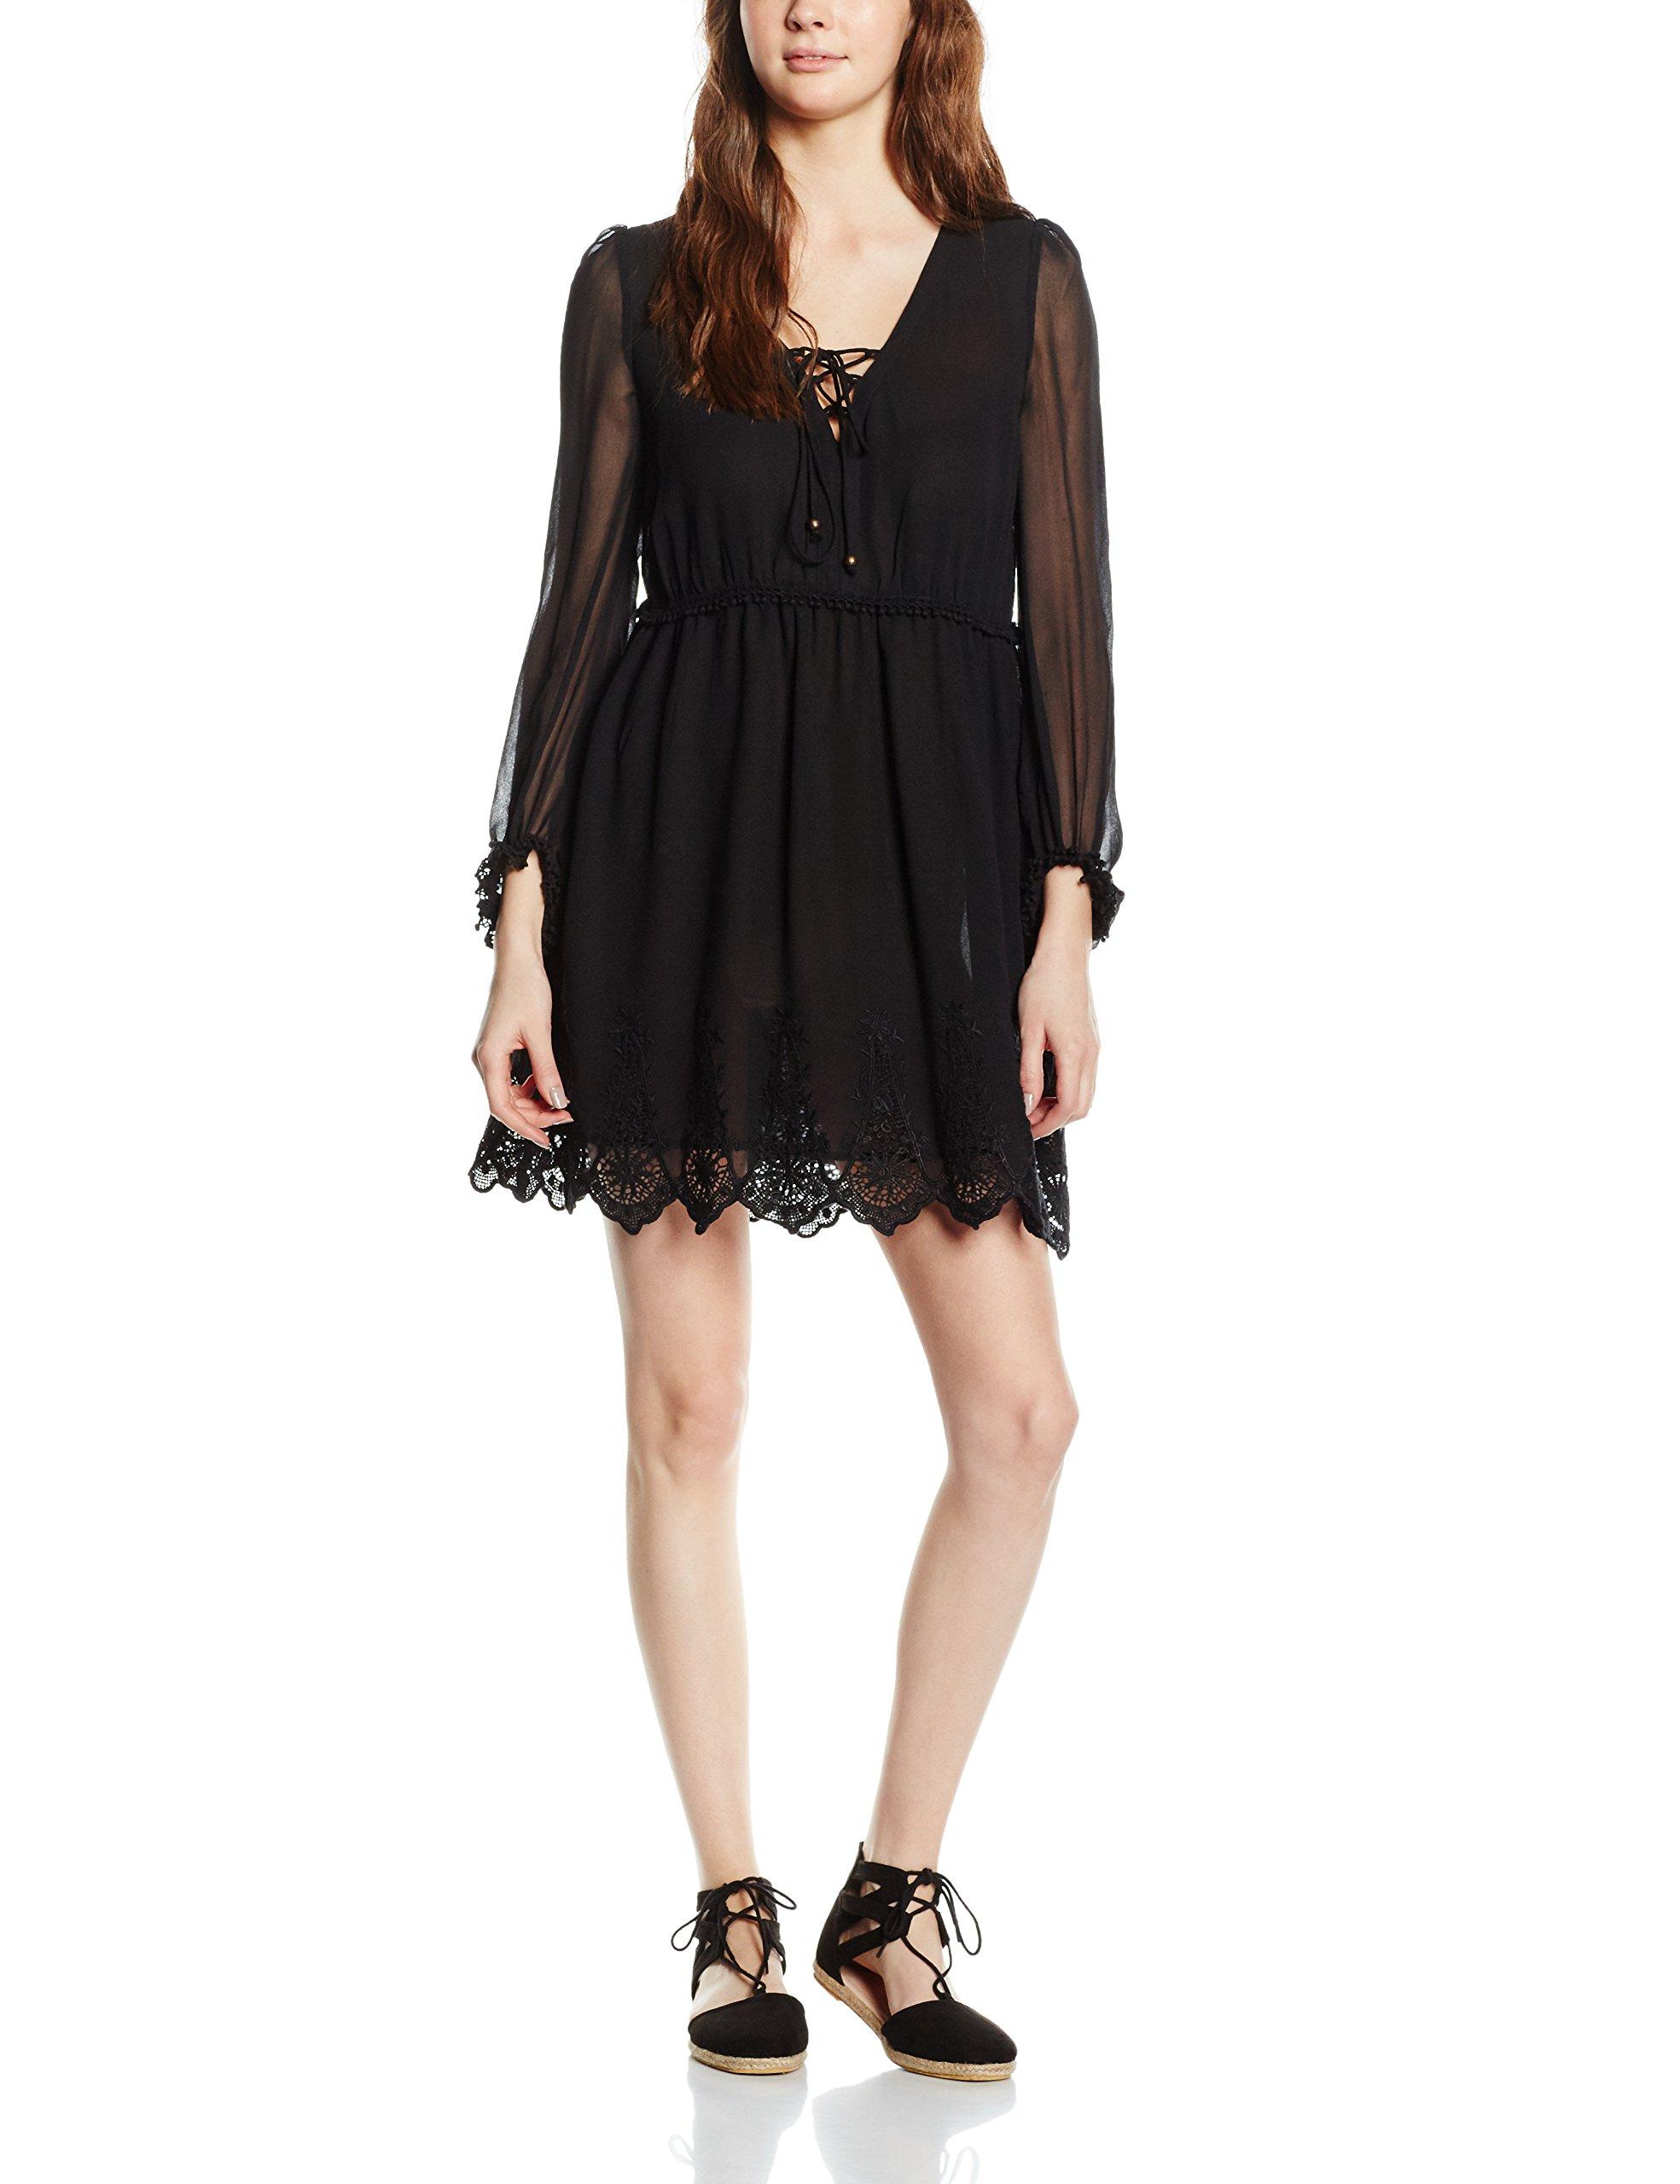 L Embroidery Robe Dress 2L s Black Cortefiel Femme wn0Nv8mO